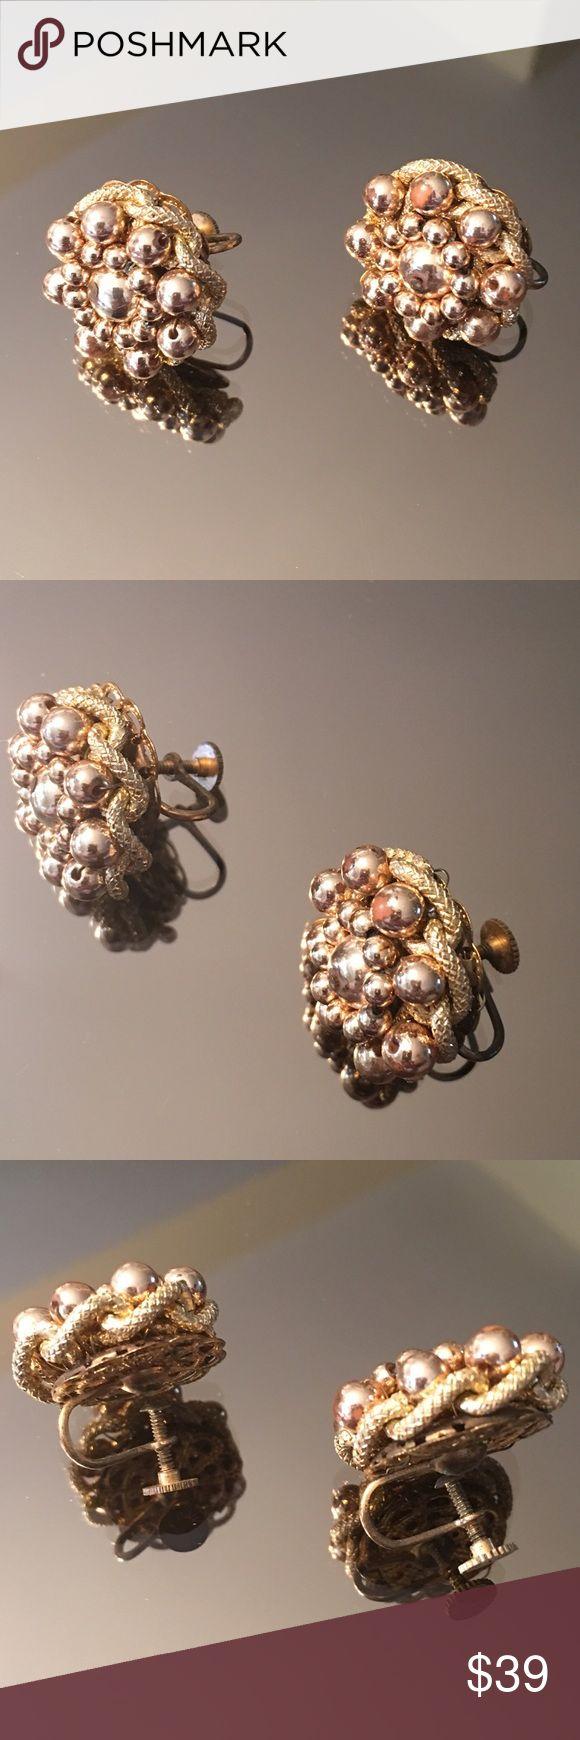 SALE! ANTIQUE 1930's SCREW BACK EARRINGS ANTIQUE 1930's SCREW BACK EARRINGS Jewelry Earrings